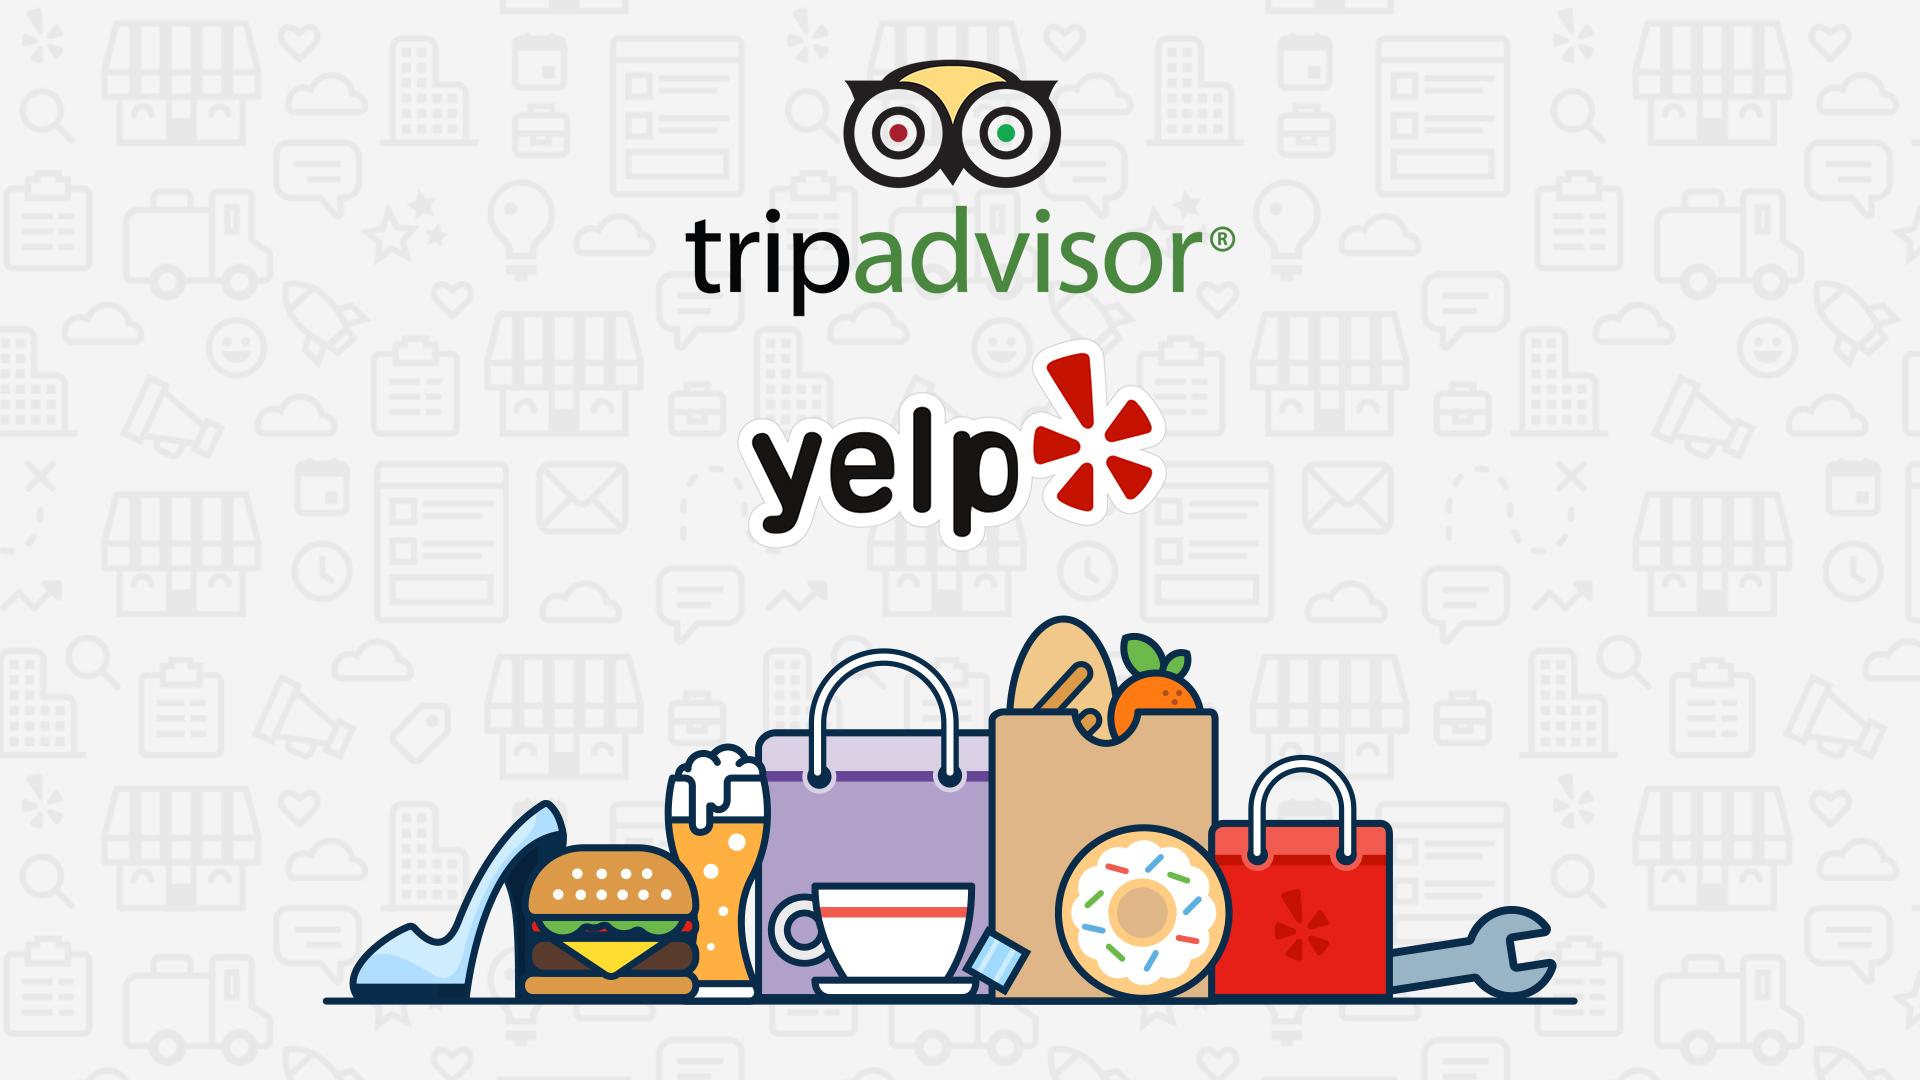 tripadvisor and yelp management on anna maria island florida - social media